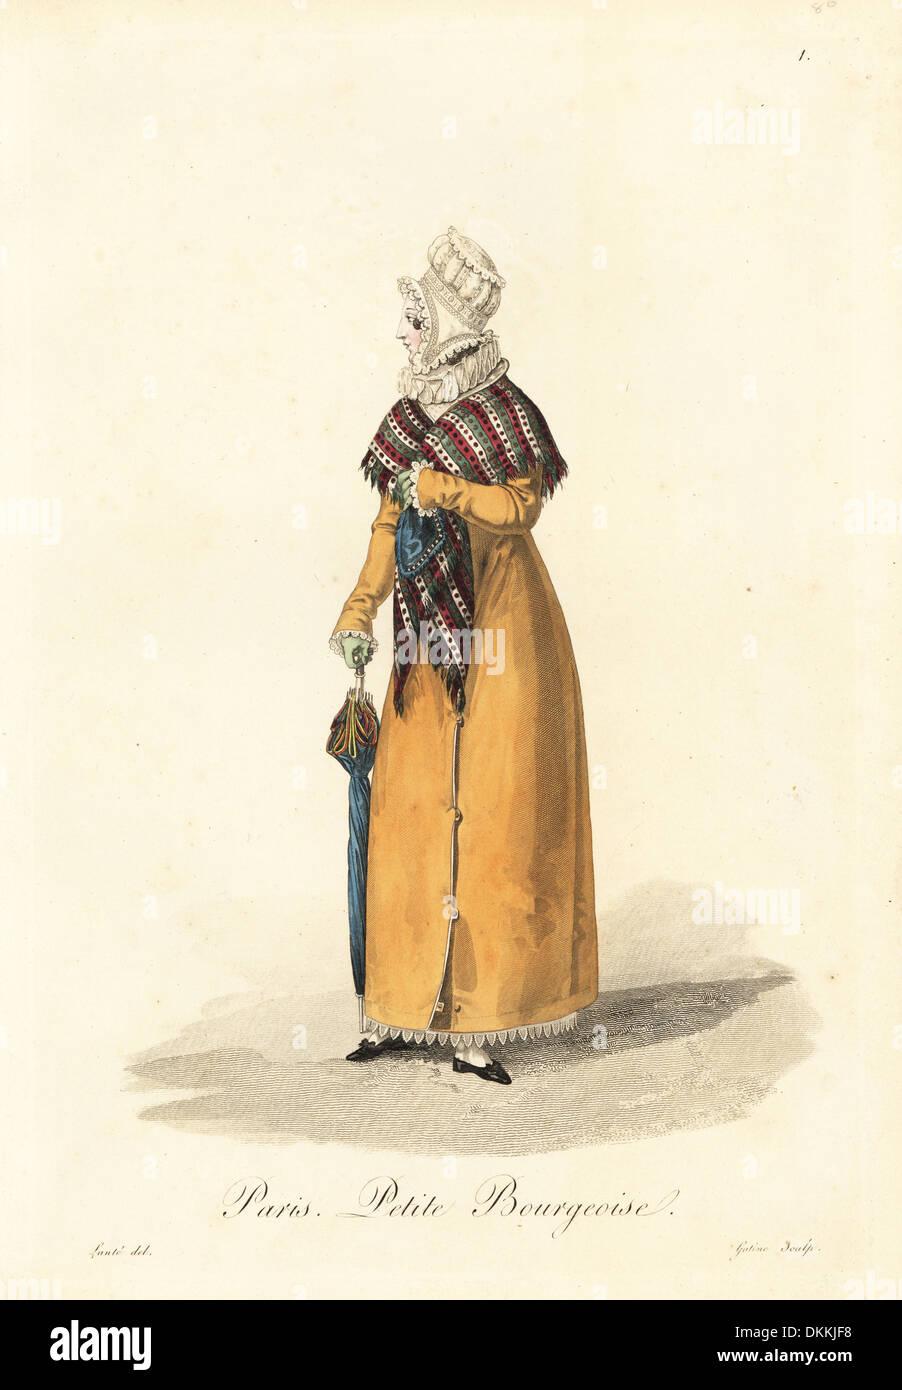 Petite bourgeoise woman of Paris carrying an umbrella. - Stock Image